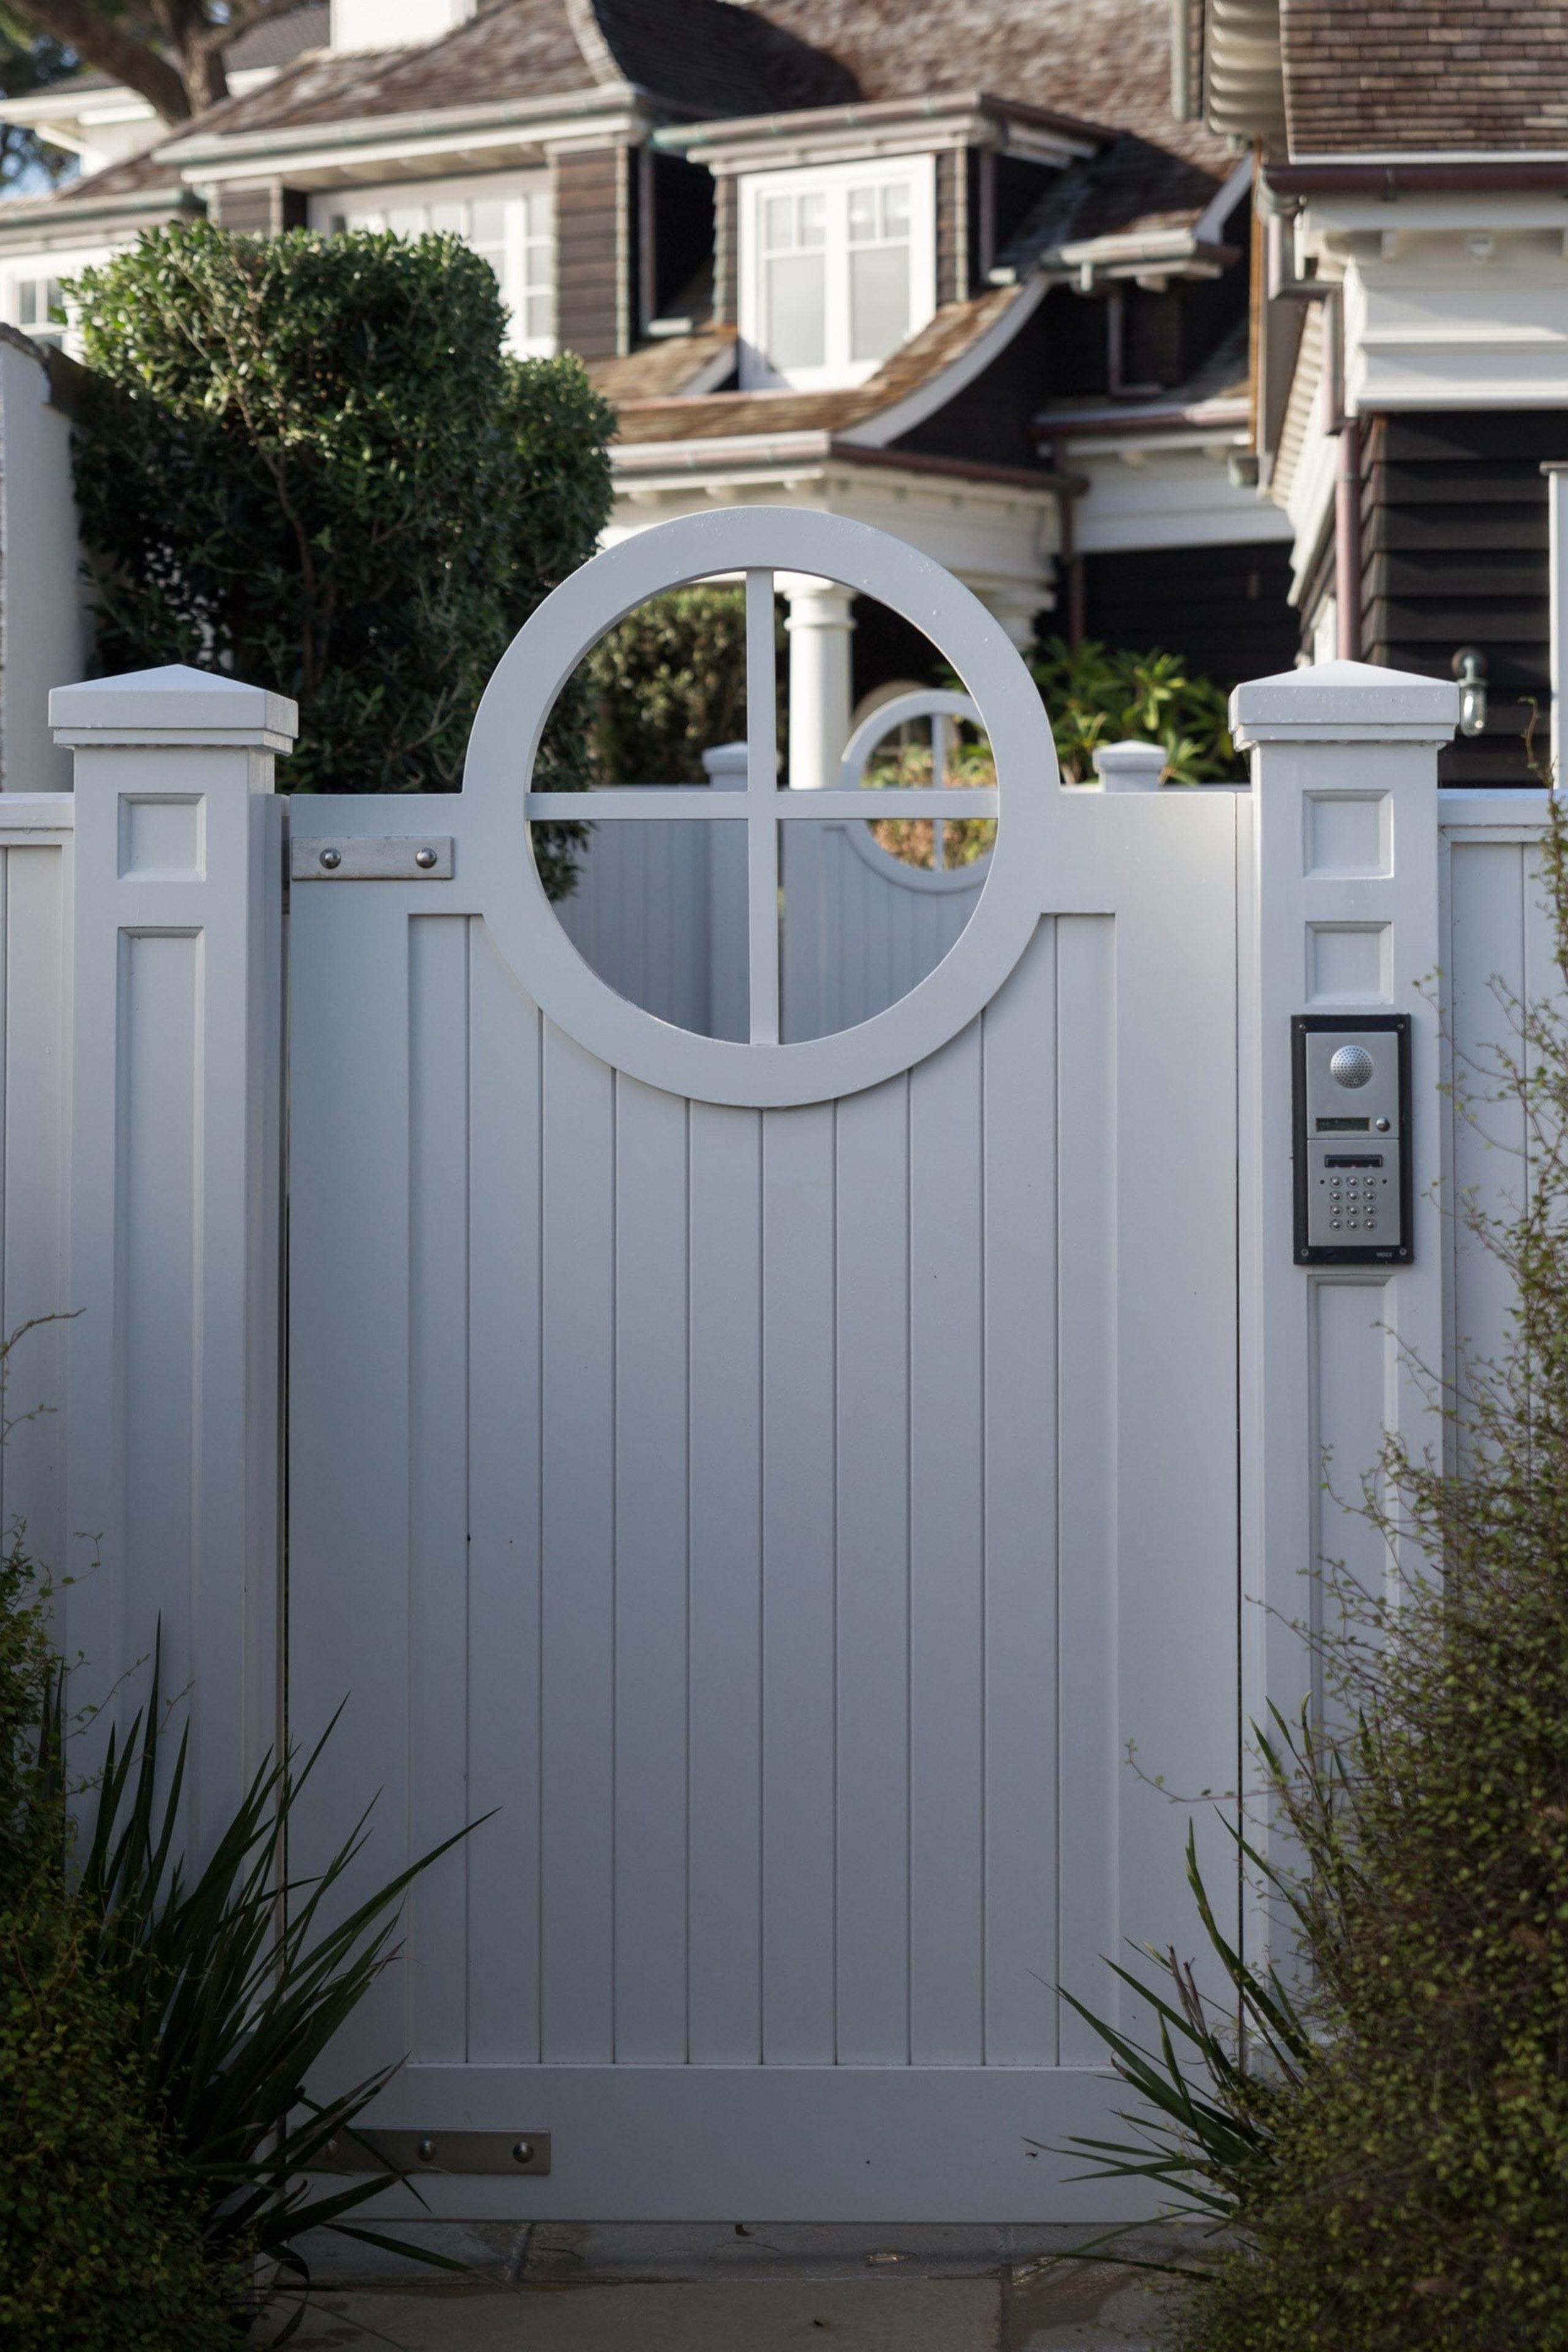 Gate - door | fence | gate | door, fence, gate, home, home fencing, house, gray, black